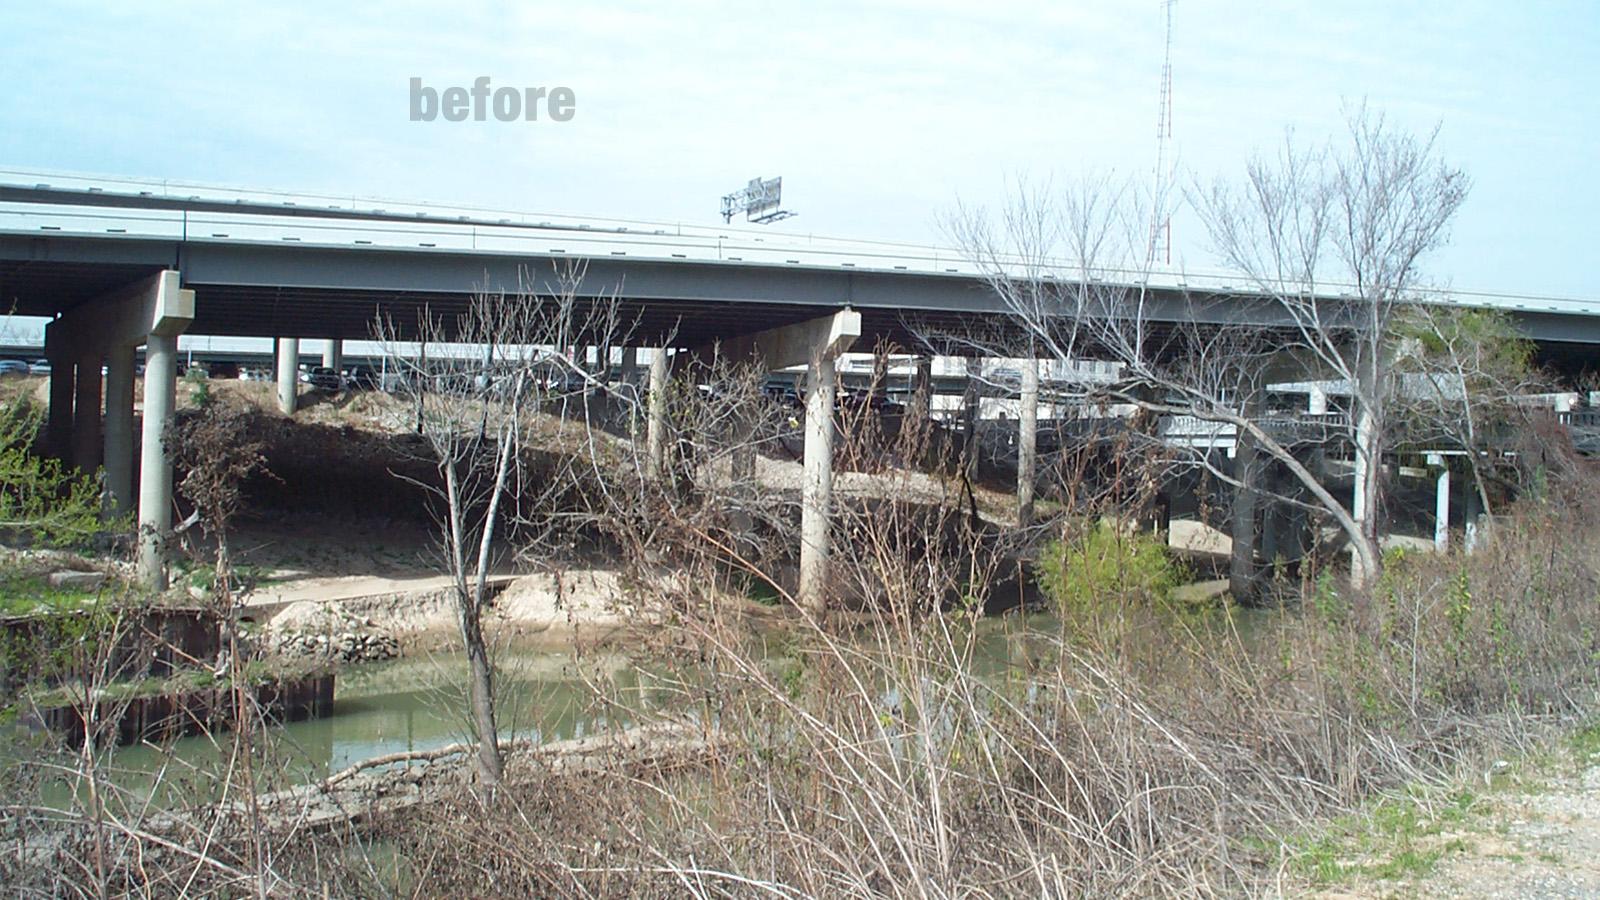 Buffalo Bayou Promenade - before improvements